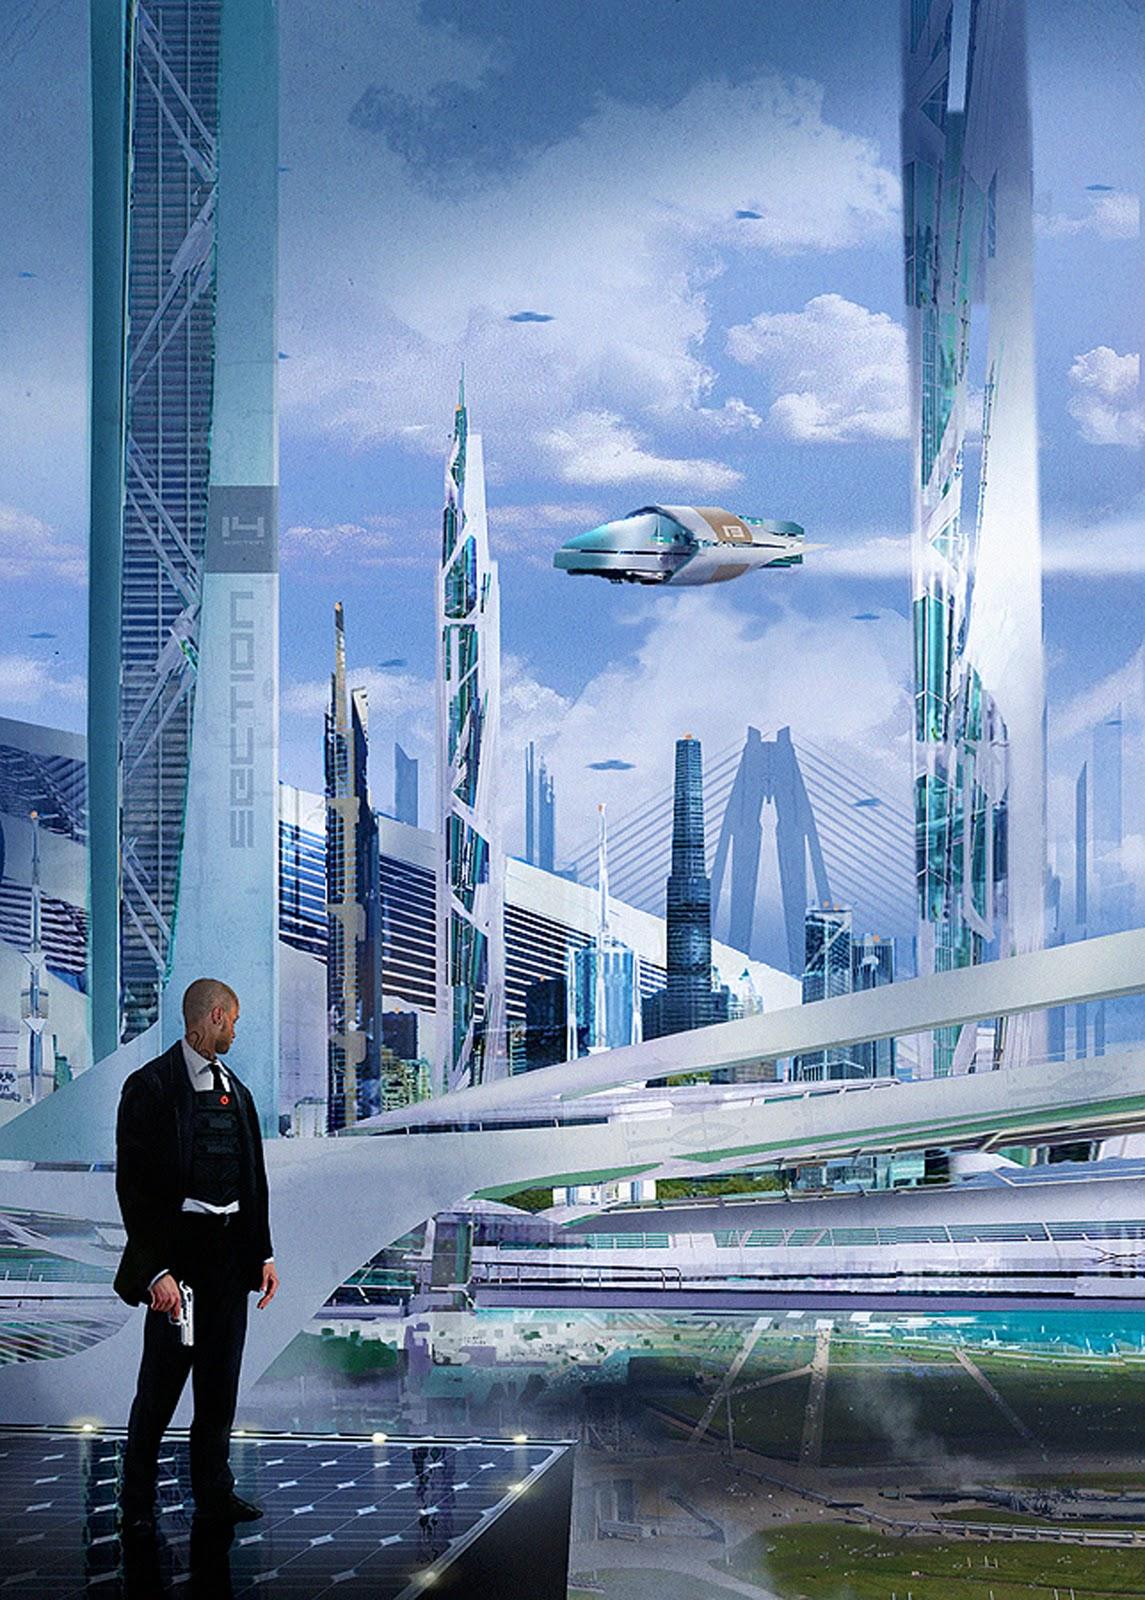 Sci-Fi Futuristic Building Concepts